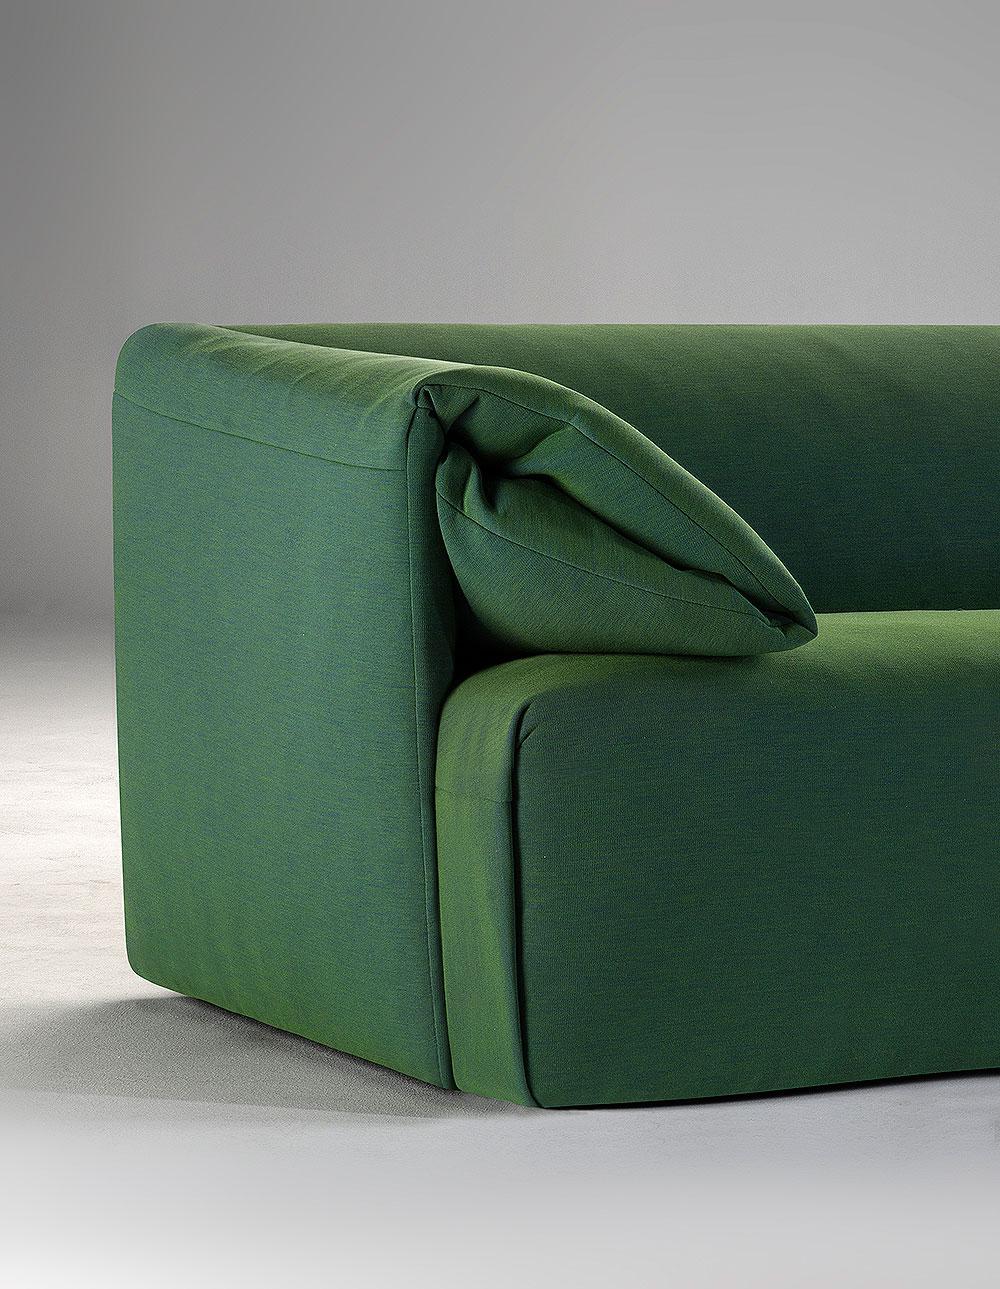 wallace-sofa-toni-palleja-office-carmenes (4)